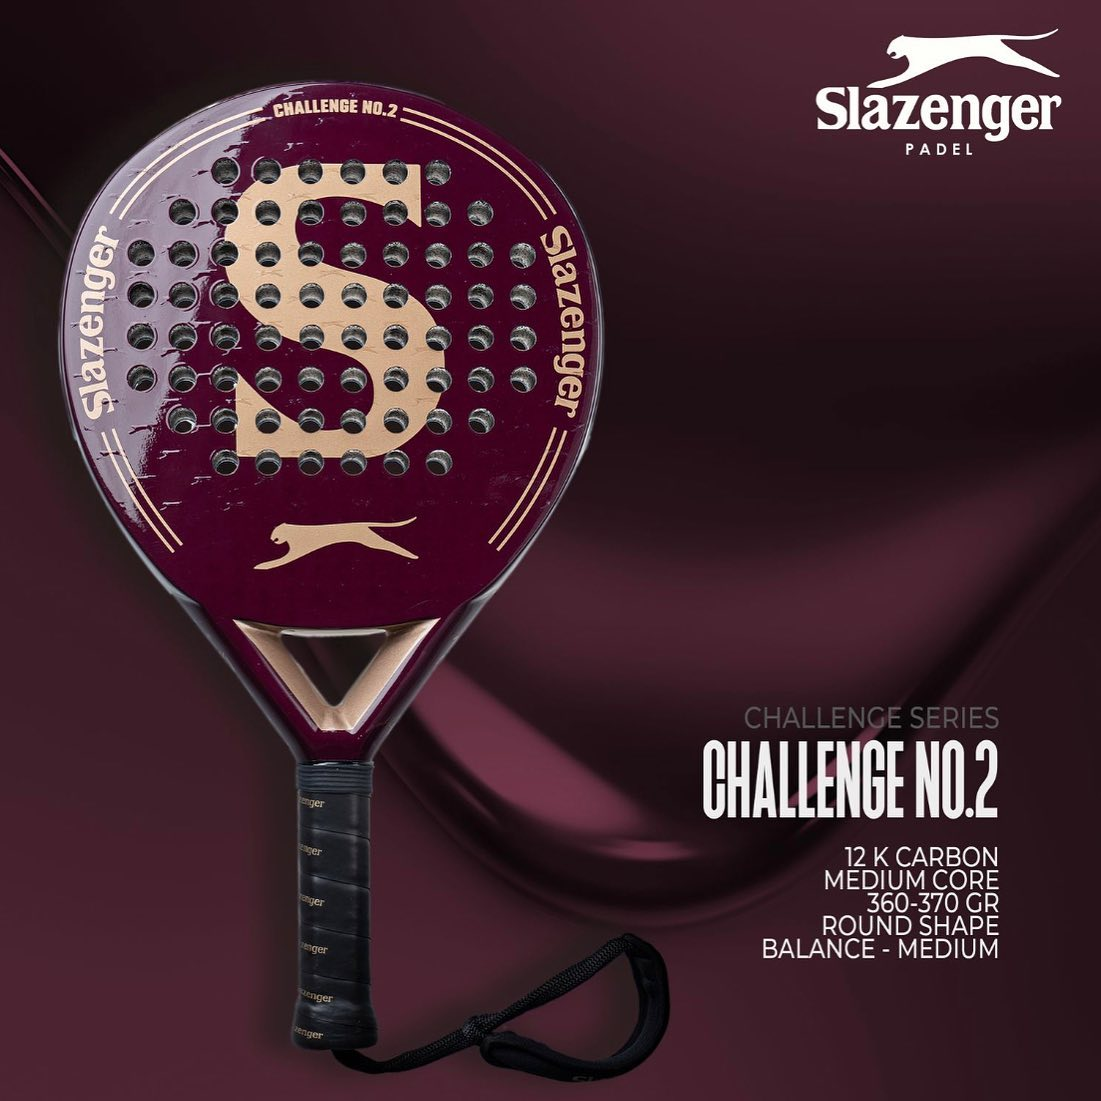 Slazenger padel 2021 Challenge No.2